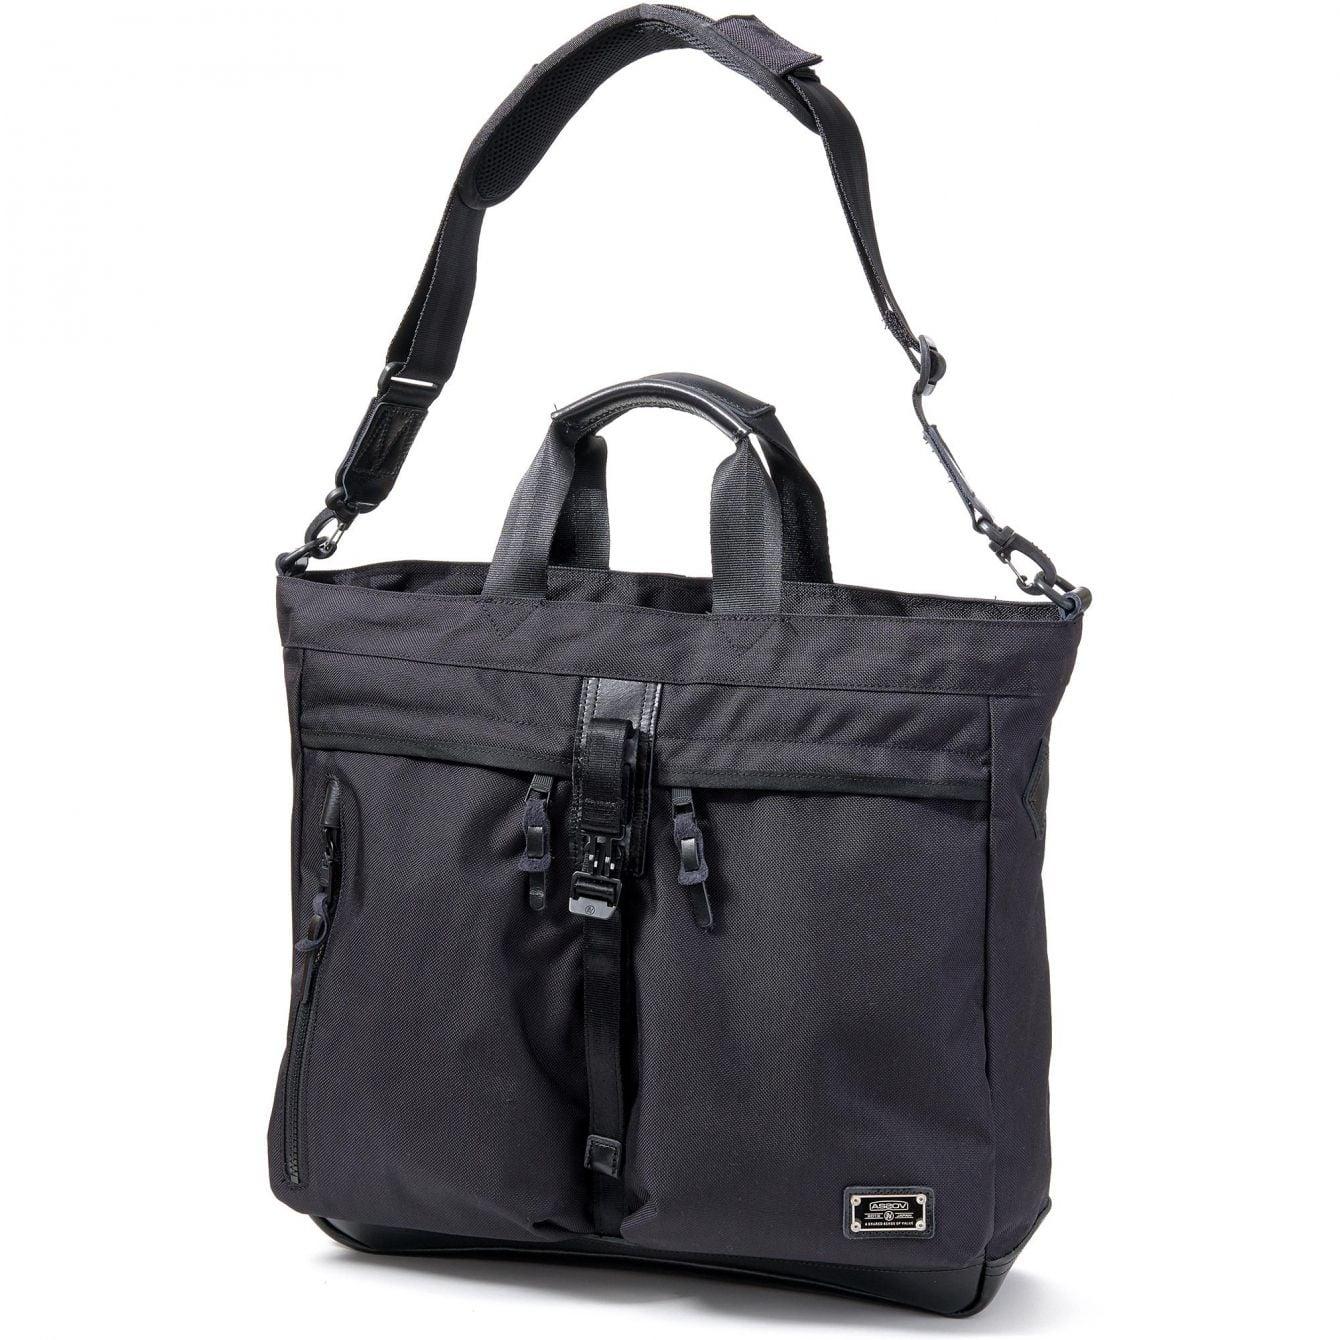 # 「AS2OV」包袋品牌獨家彈道尼龍:2WAY SHOULDER & BODY BAG 新品上市 1